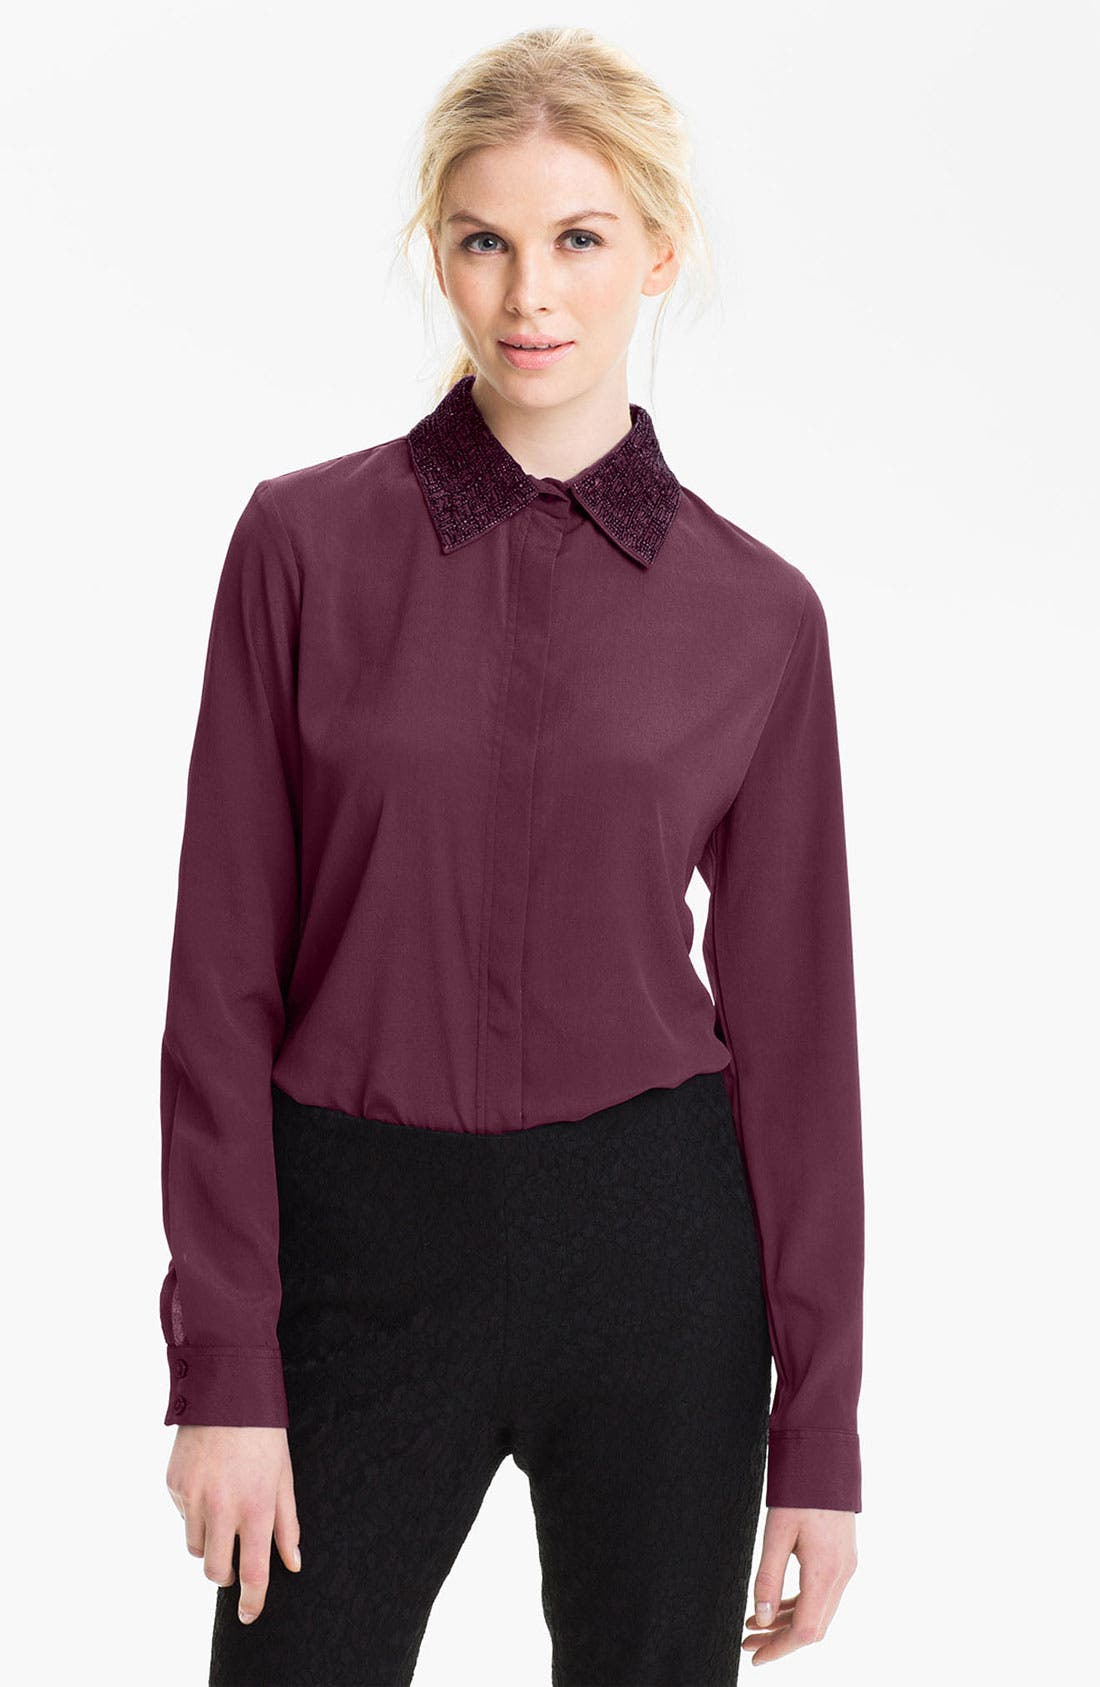 Main Image - Max & Mia Embellished Collar Blouse